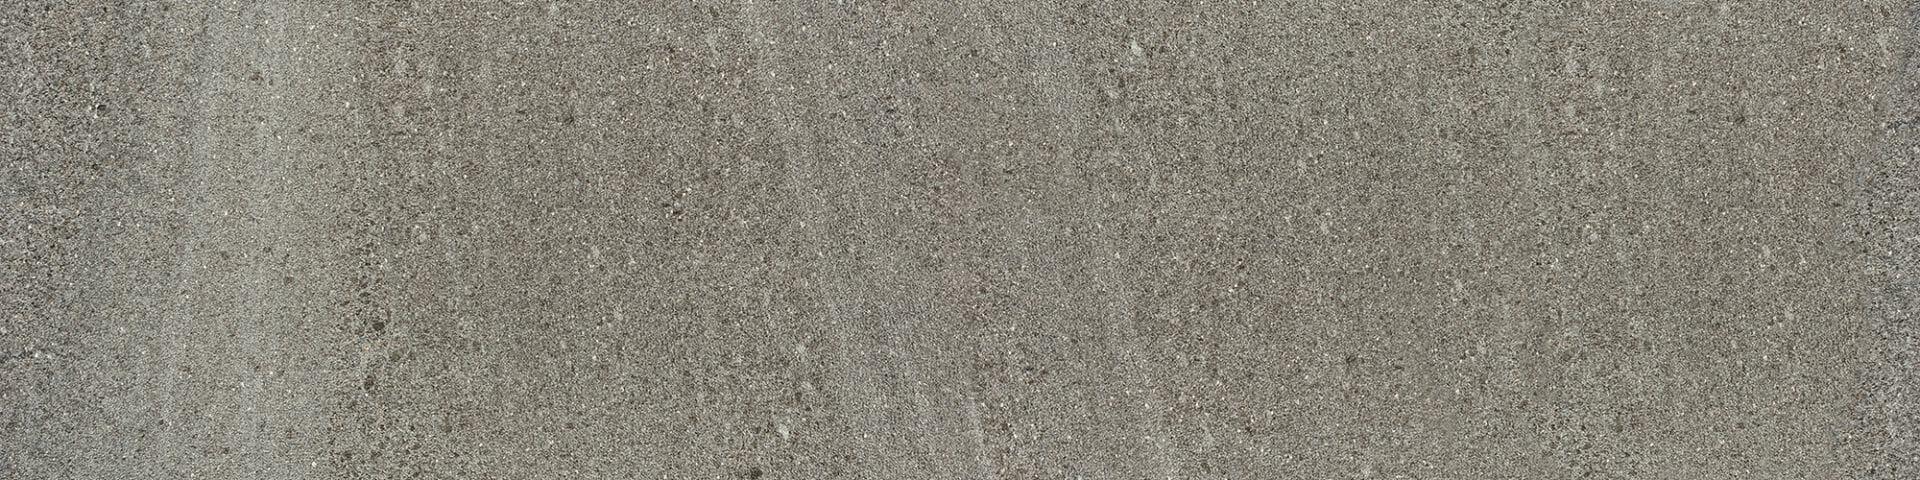 grespania-lyon-dark-grey-indoor-outdoor-tile